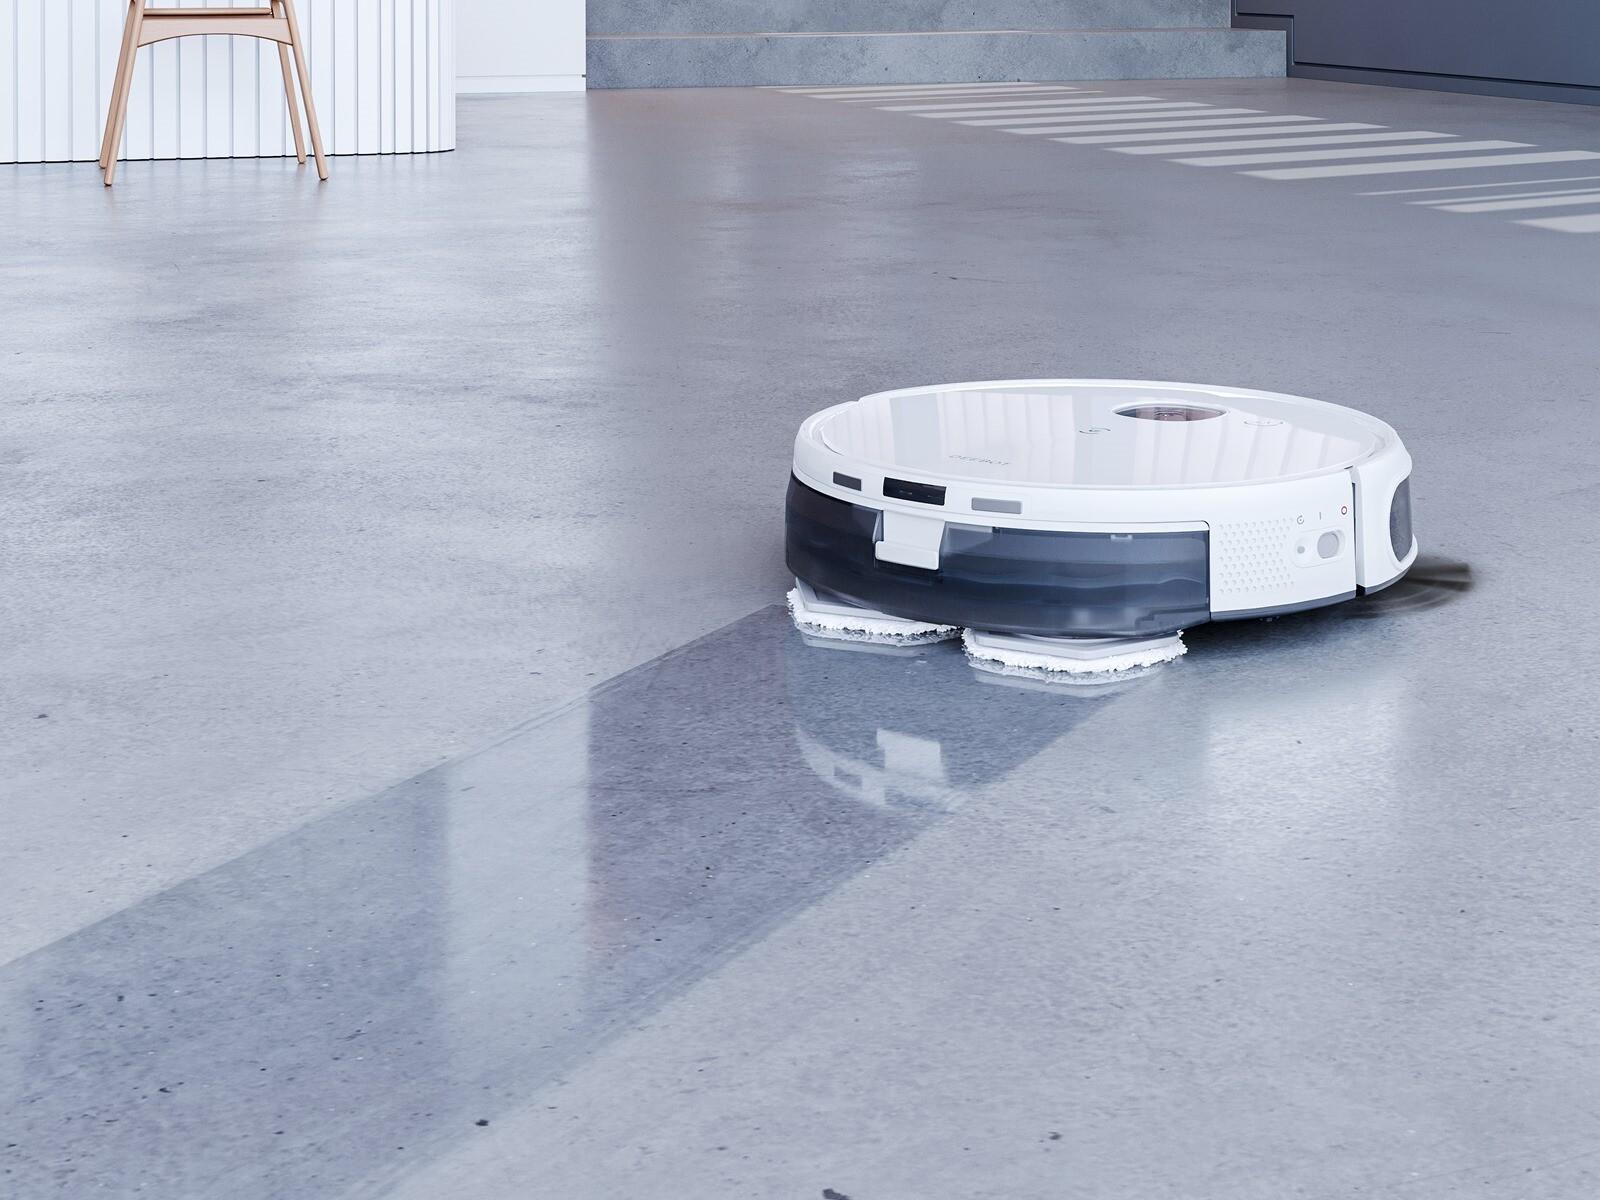 ECOVACS DEEBOT N9+掃拖機器人強勢登場 吸掃拖洗風乾五合一功能全台首見 居家防疫期清潔家電需求升溫 618 年中慶超前部署早鳥優惠 NT$15,900 @3C 達人廖阿輝